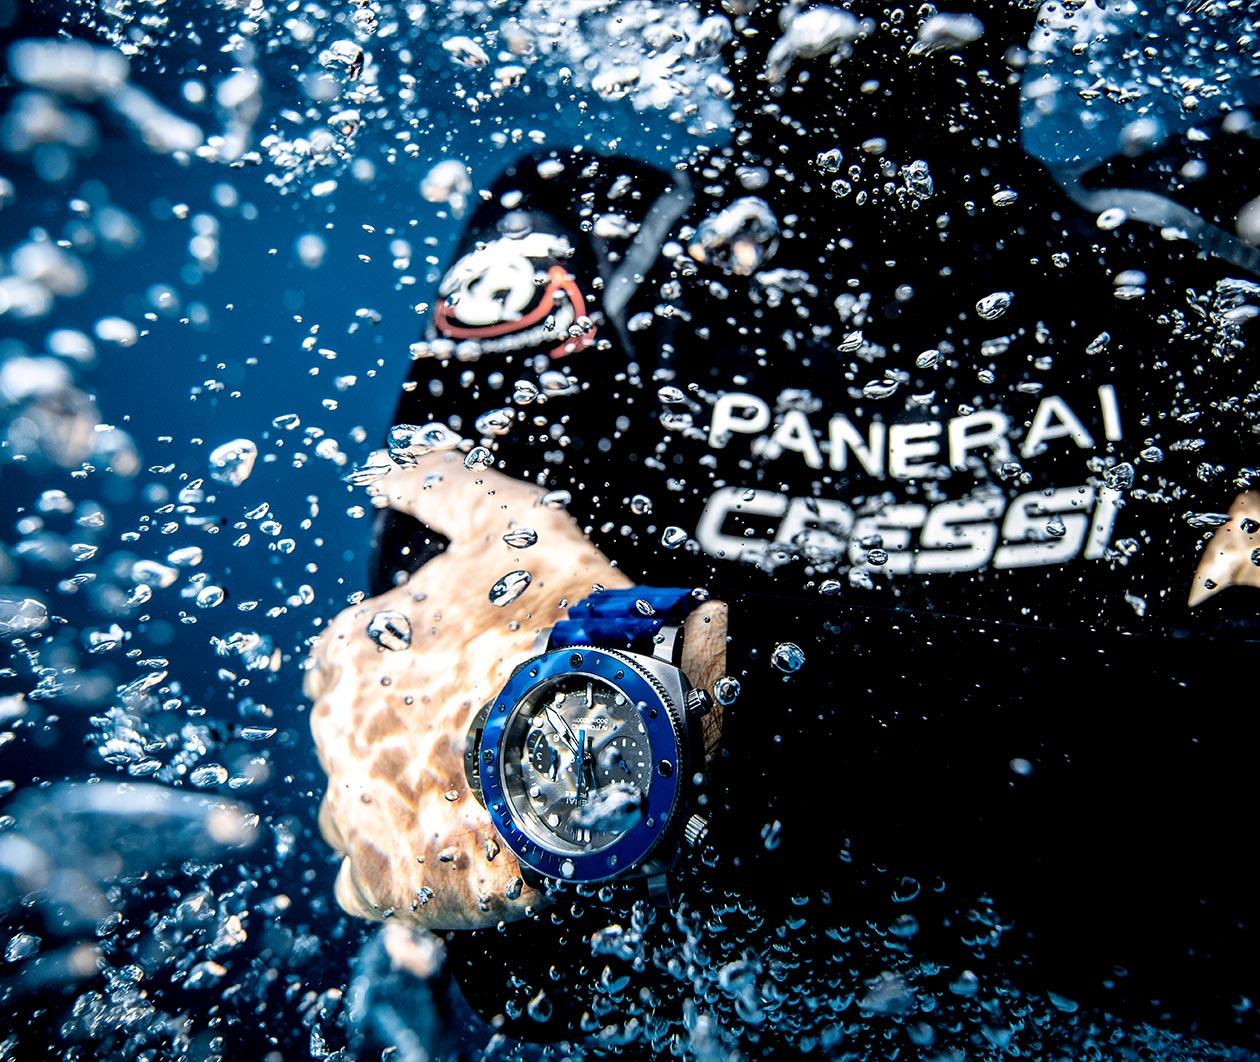 Panerai Submersible ChronoGuillaumeNeryEdition47MM PAM00982 Carousel 4 FINAL